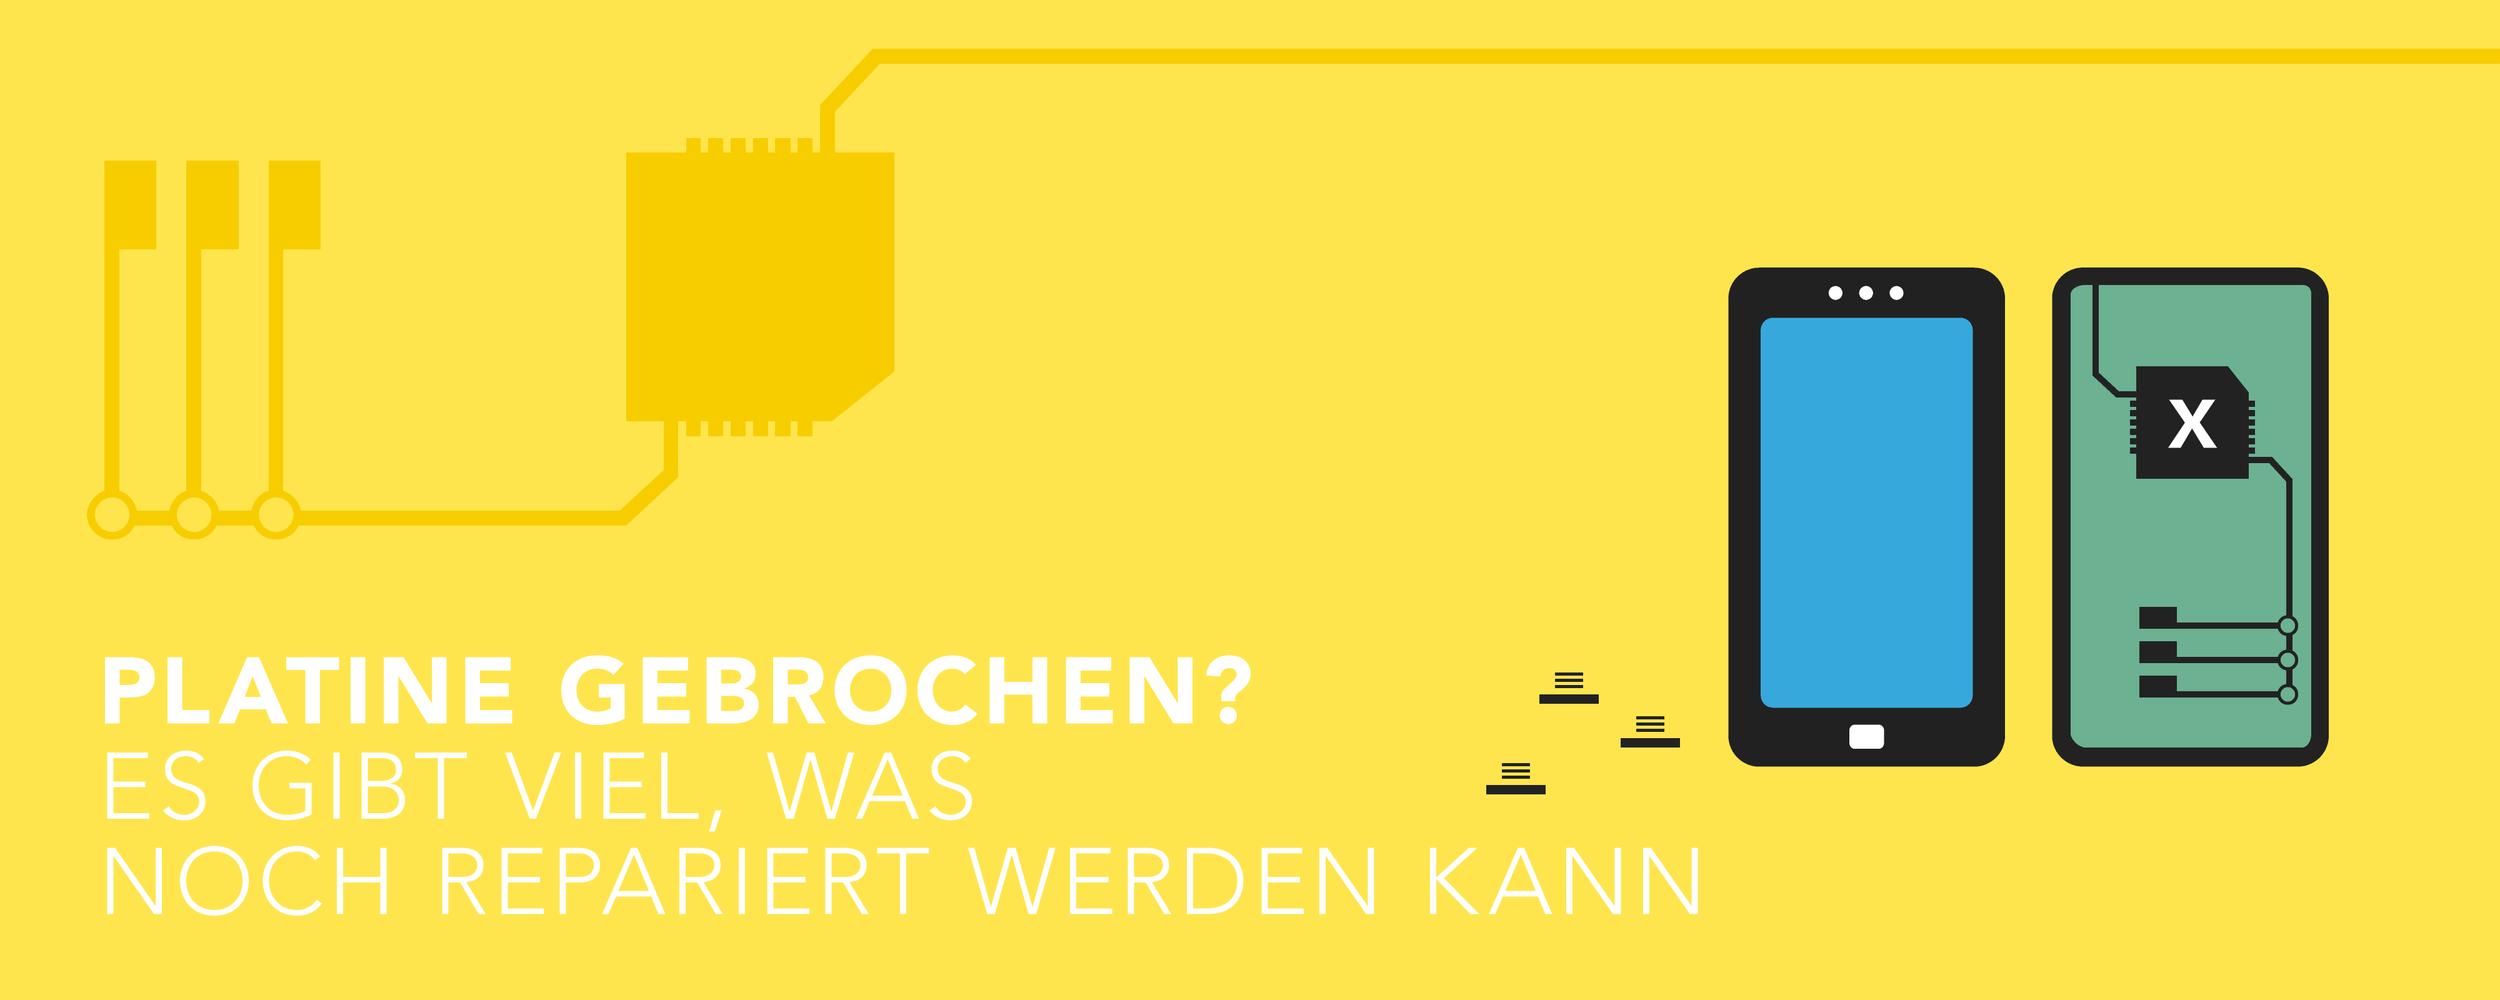 systemfehler_banner.png